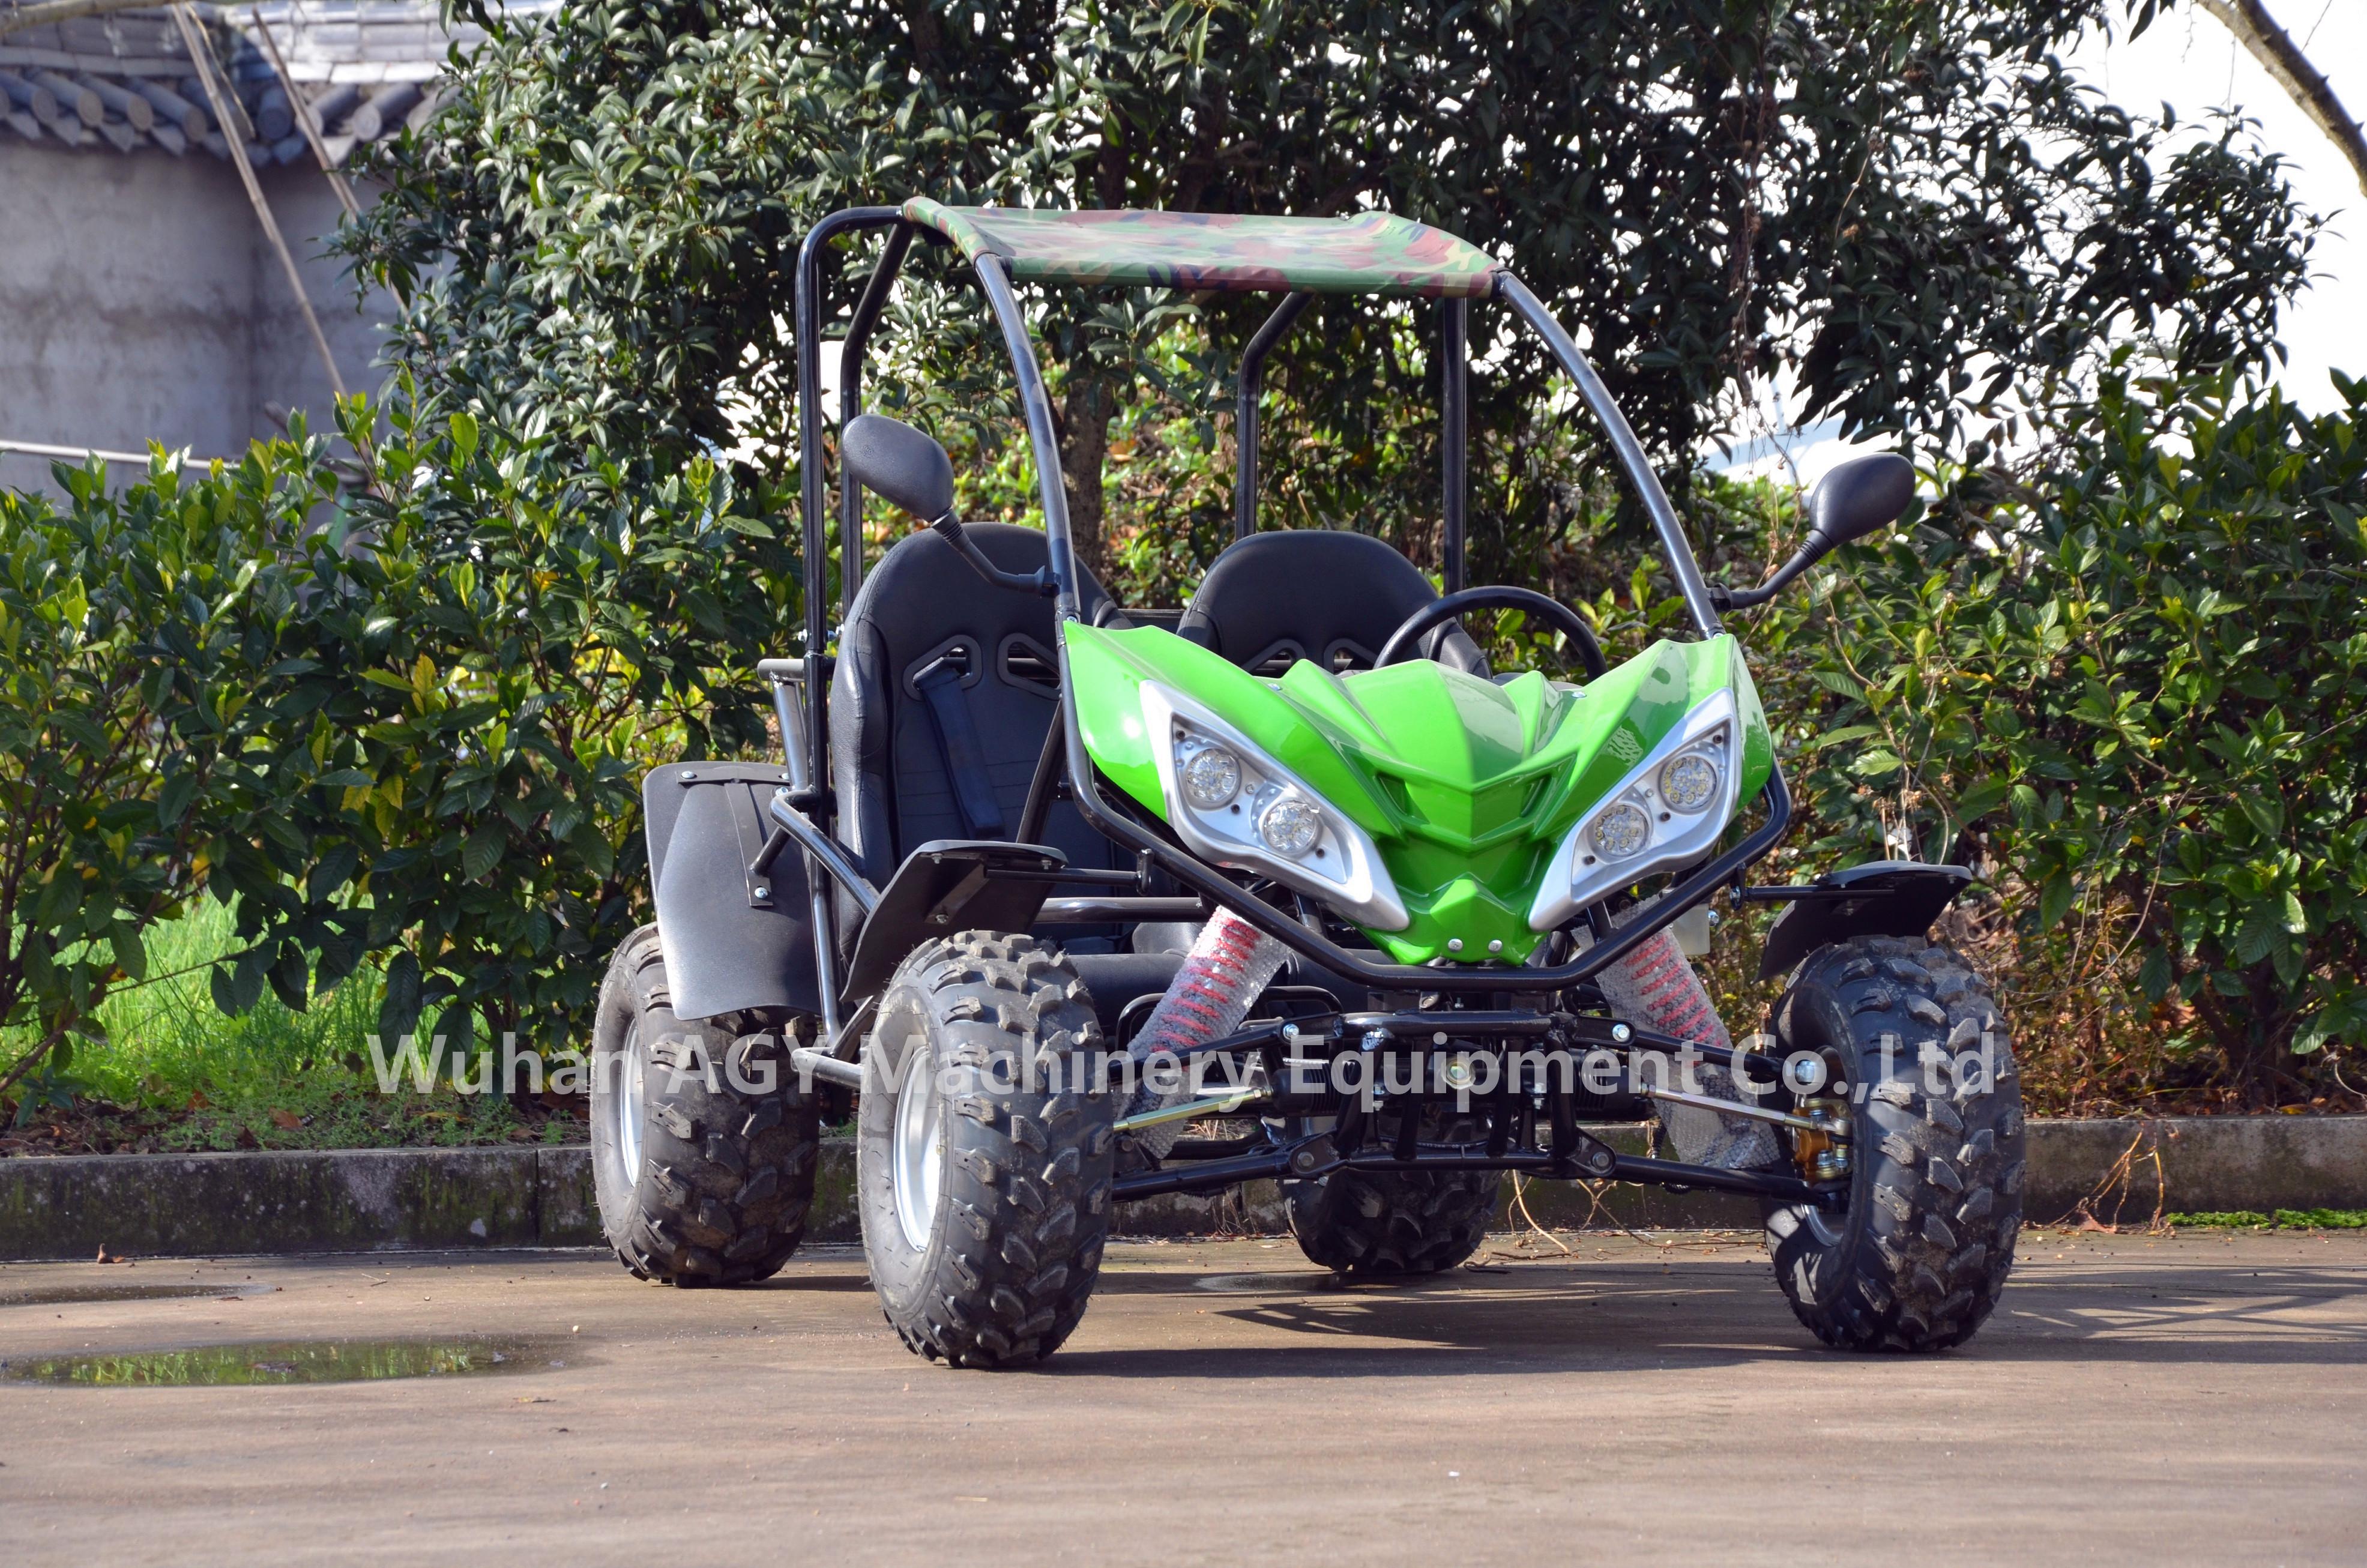 AGY for kid children 125cc mini buggy